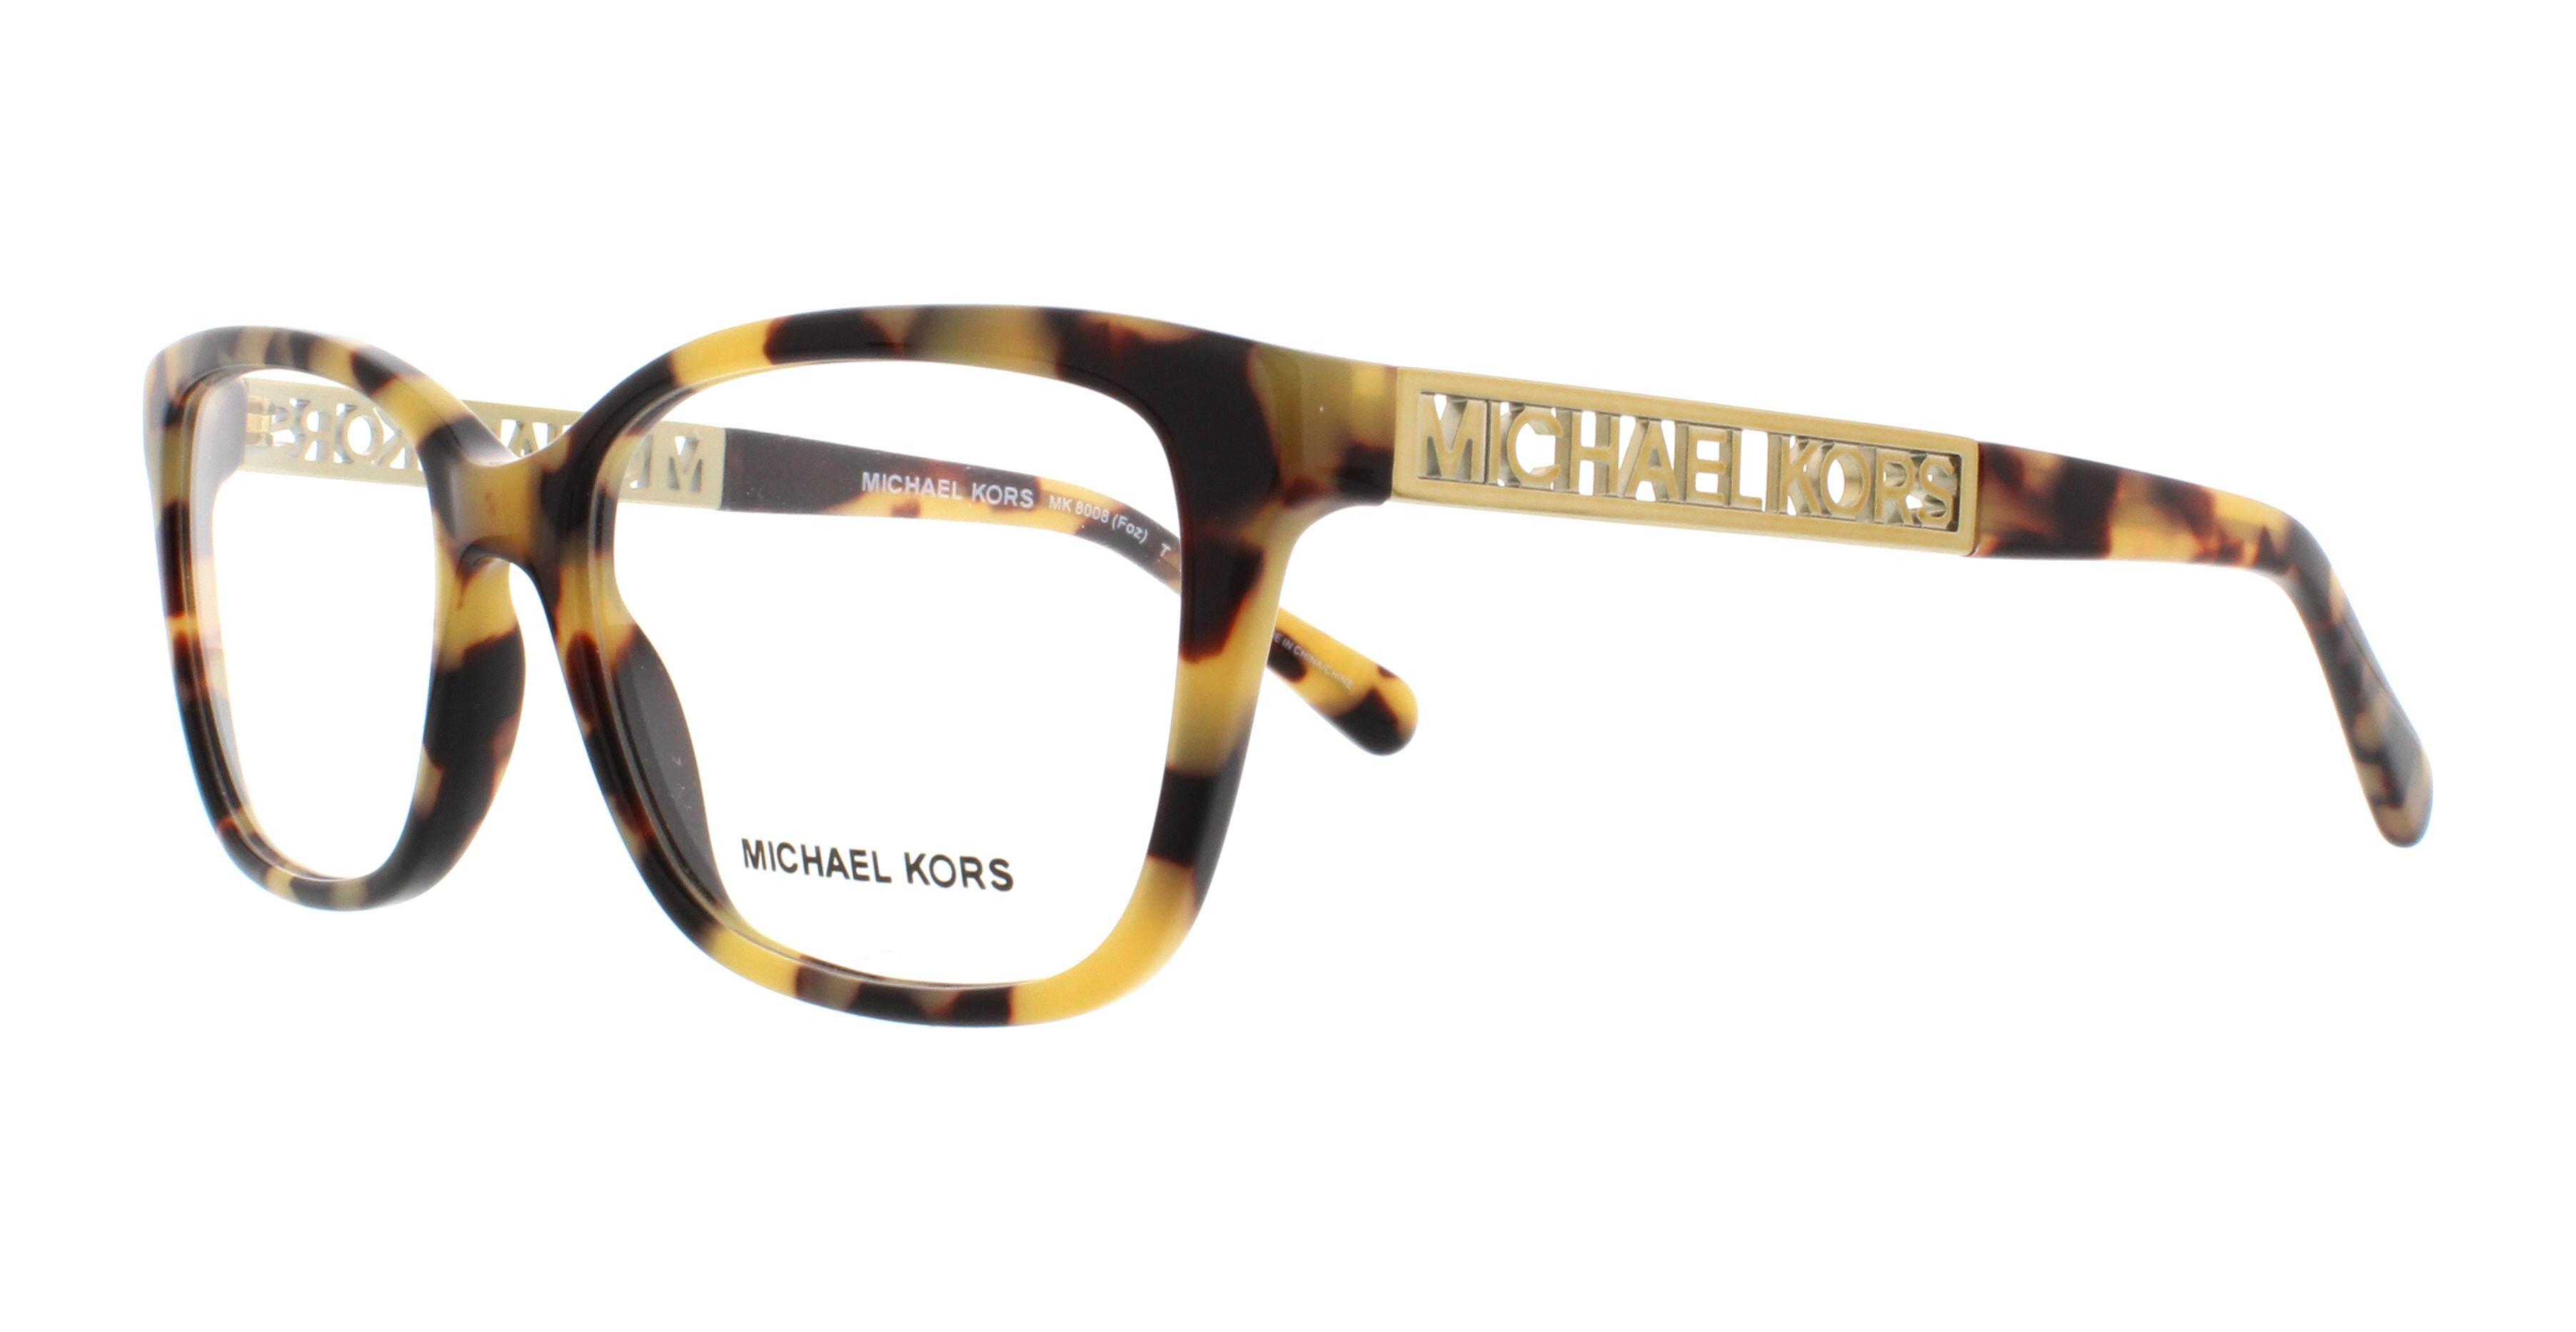 MICHAEL KORS Eyeglasses MK8008 FOZ 3013 Vintage Tortoise 52MM ...